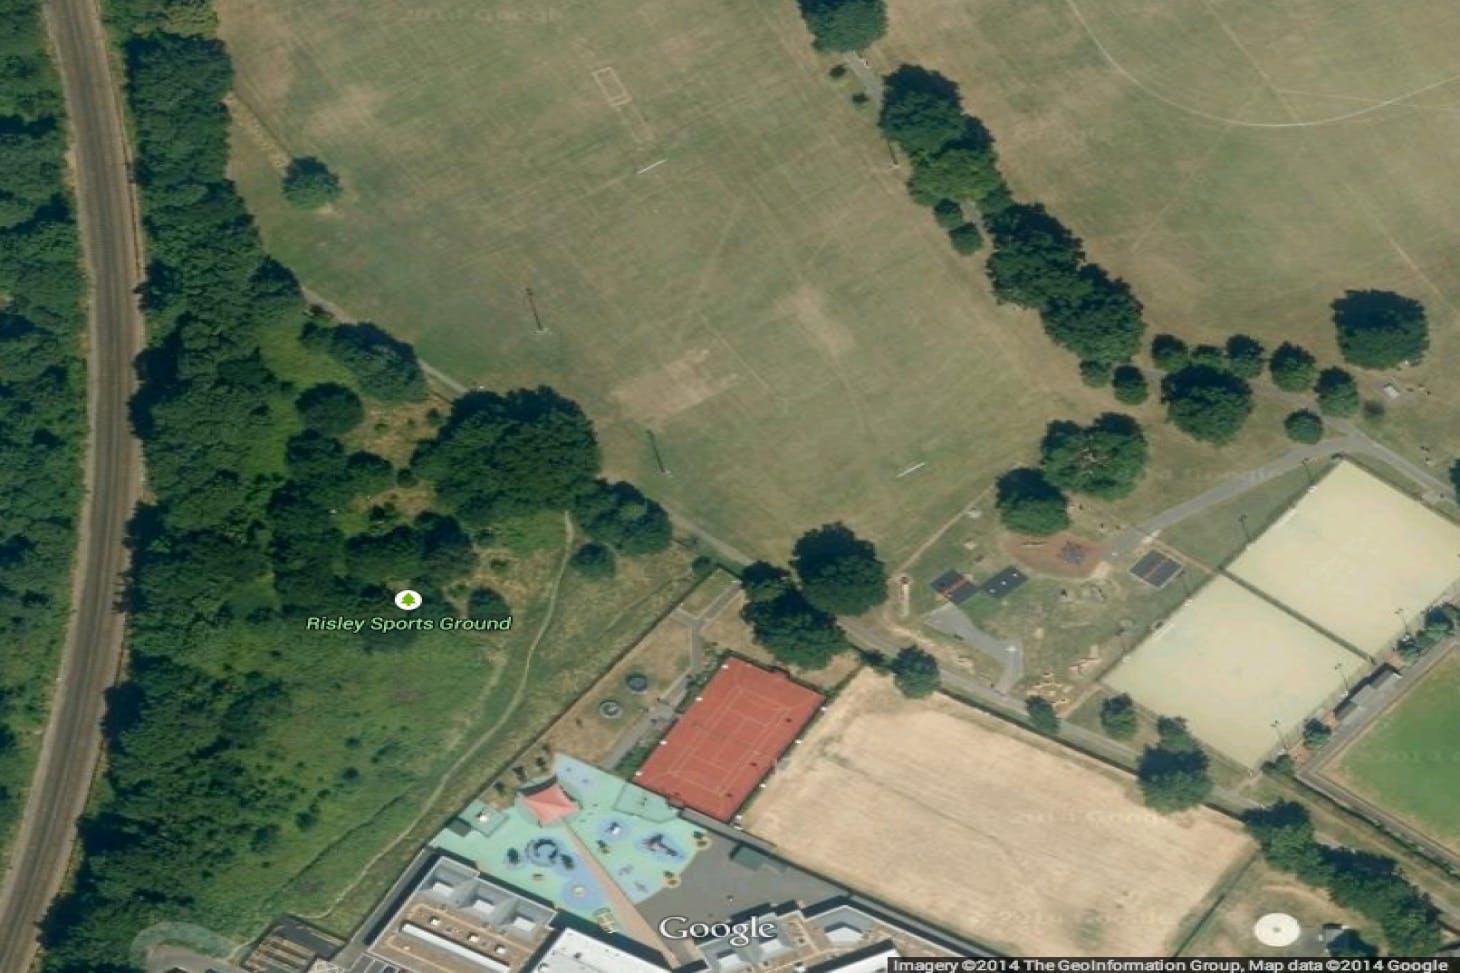 Morden Recreation Ground 11 a side   Grass football pitch